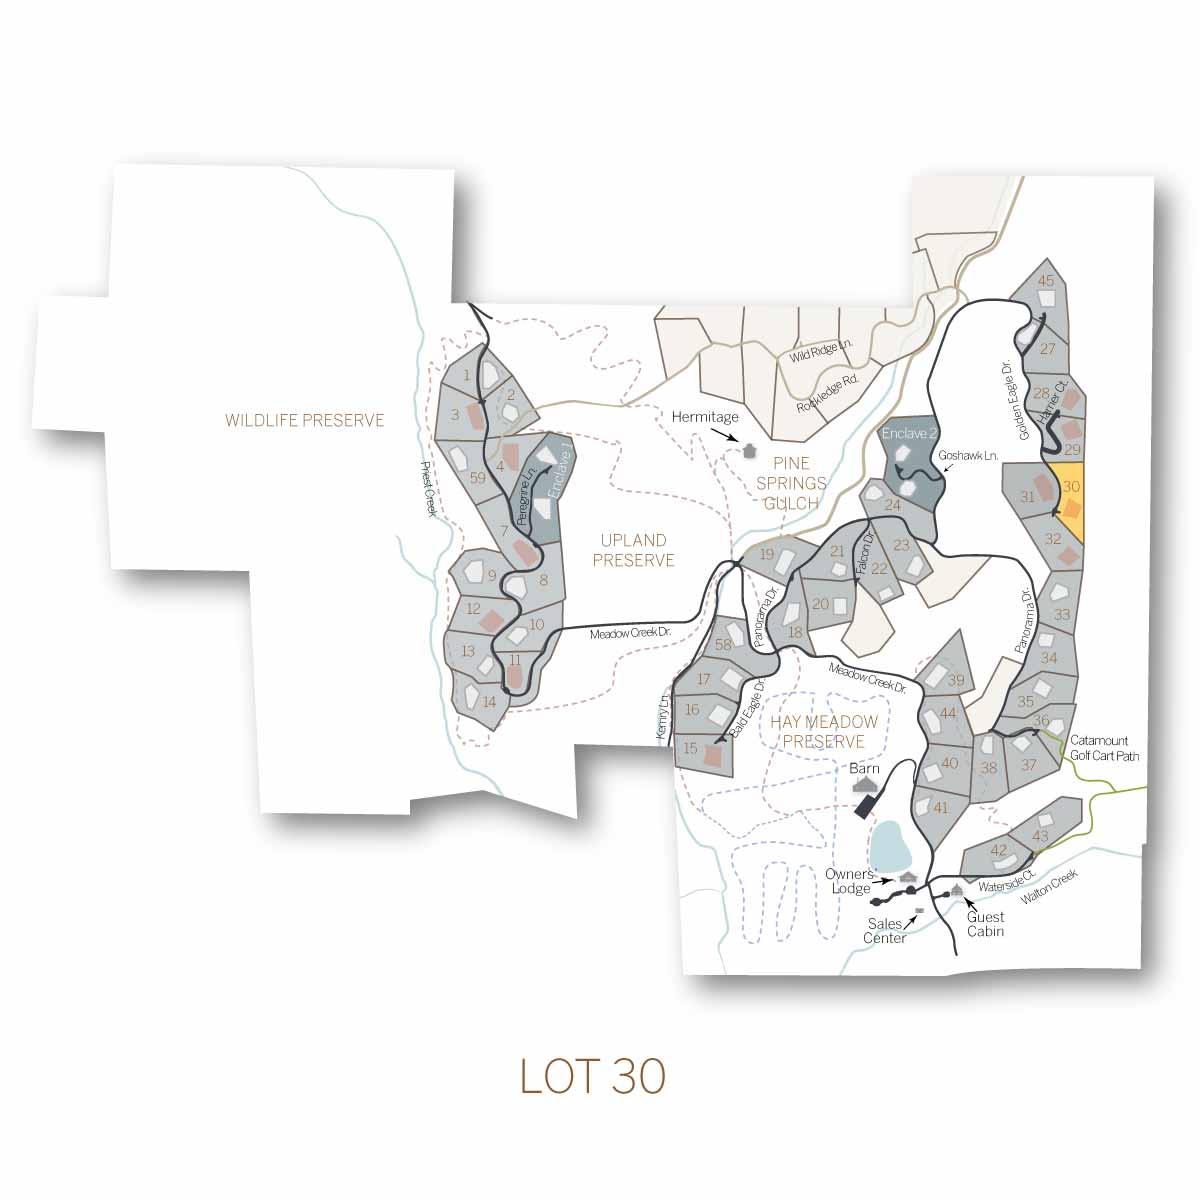 lot 30 - Homesite #30